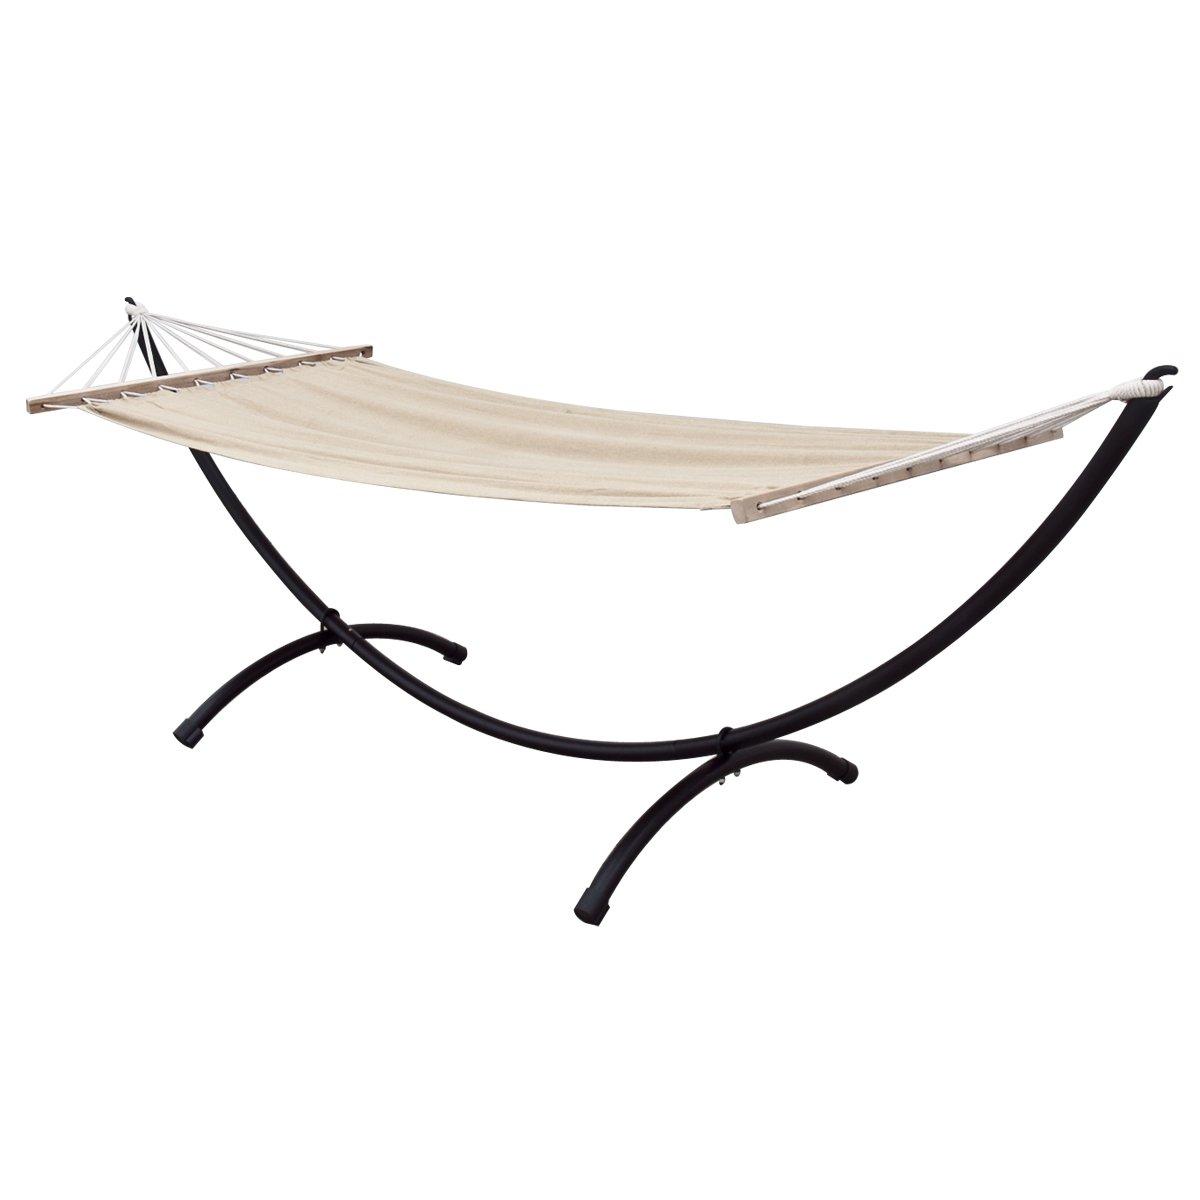 amazon     apontus single hammock with space saving steel stand 9 8 ft   garden  u0026 outdoor amazon     apontus single hammock with space saving steel stand      rh   amazon